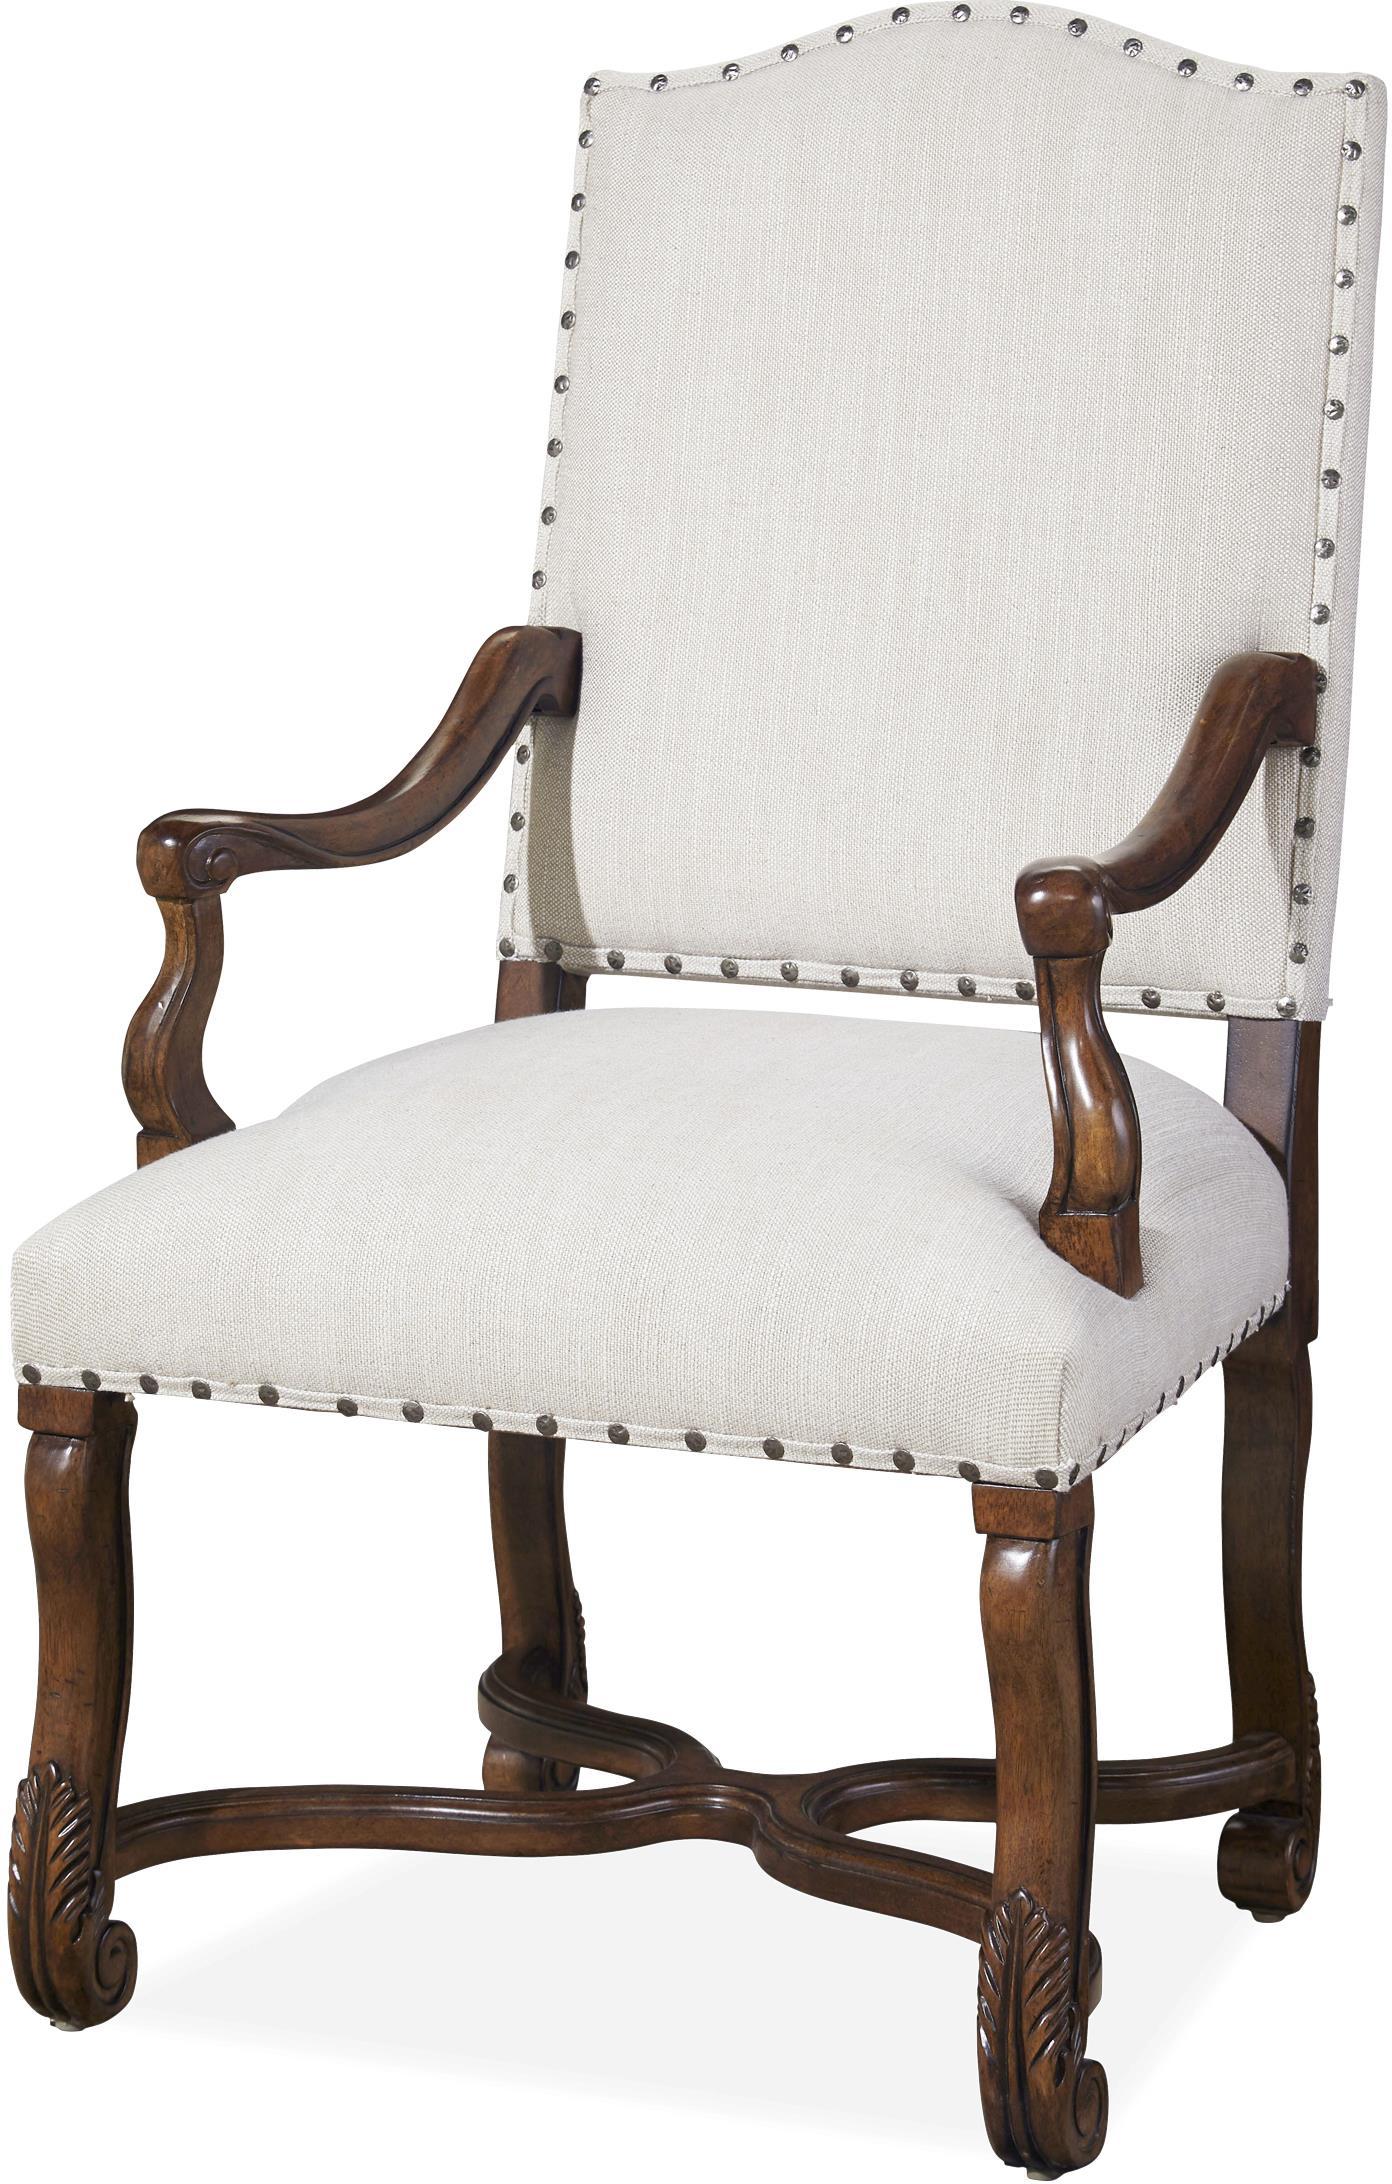 Paula Deen Darling Darling Hostess Chair - Item Number: 596639-RTA